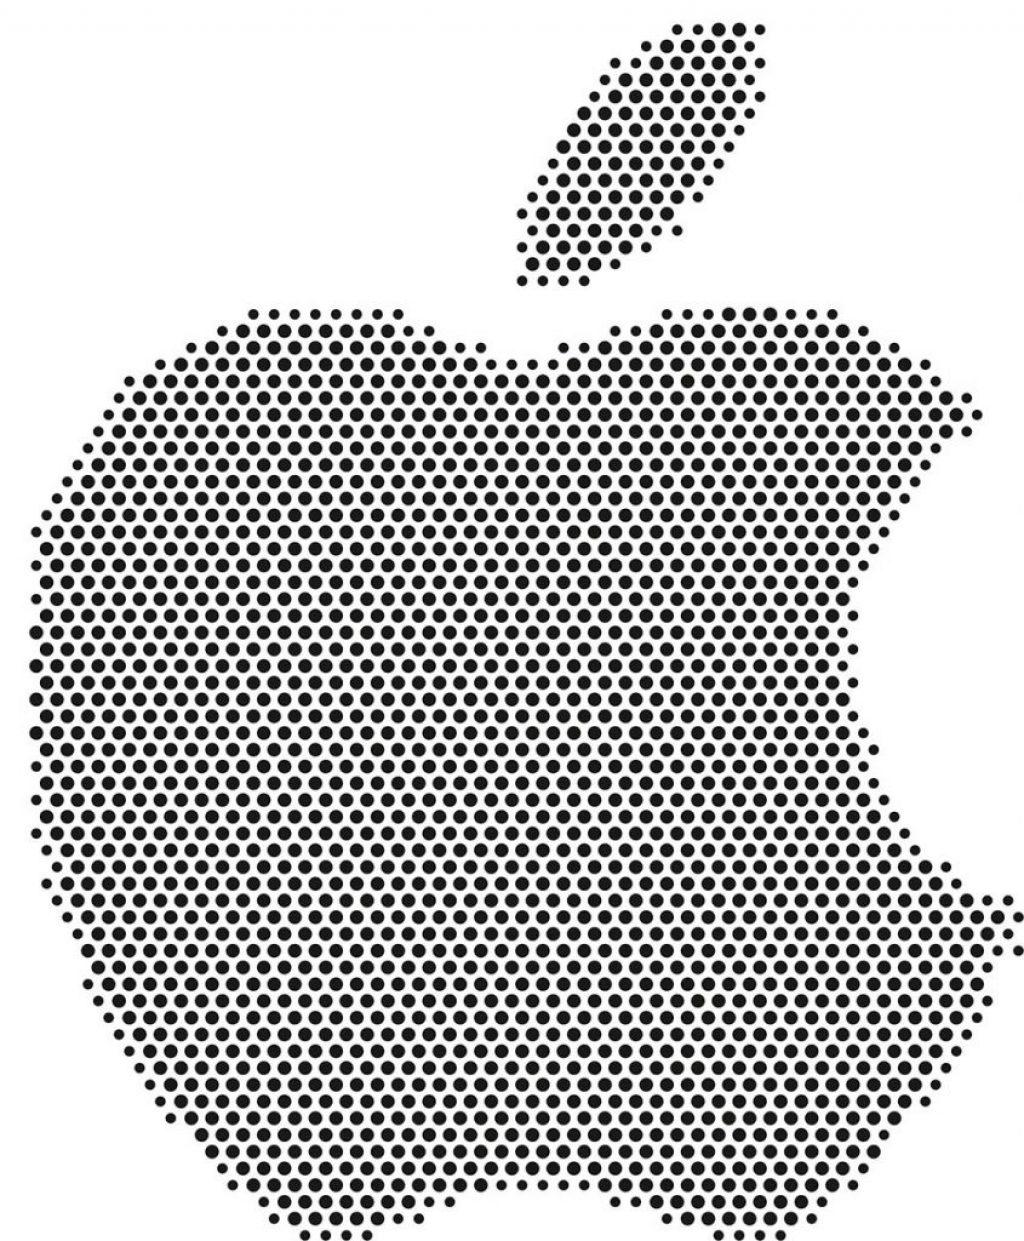 grafic_logo forme text.cdr